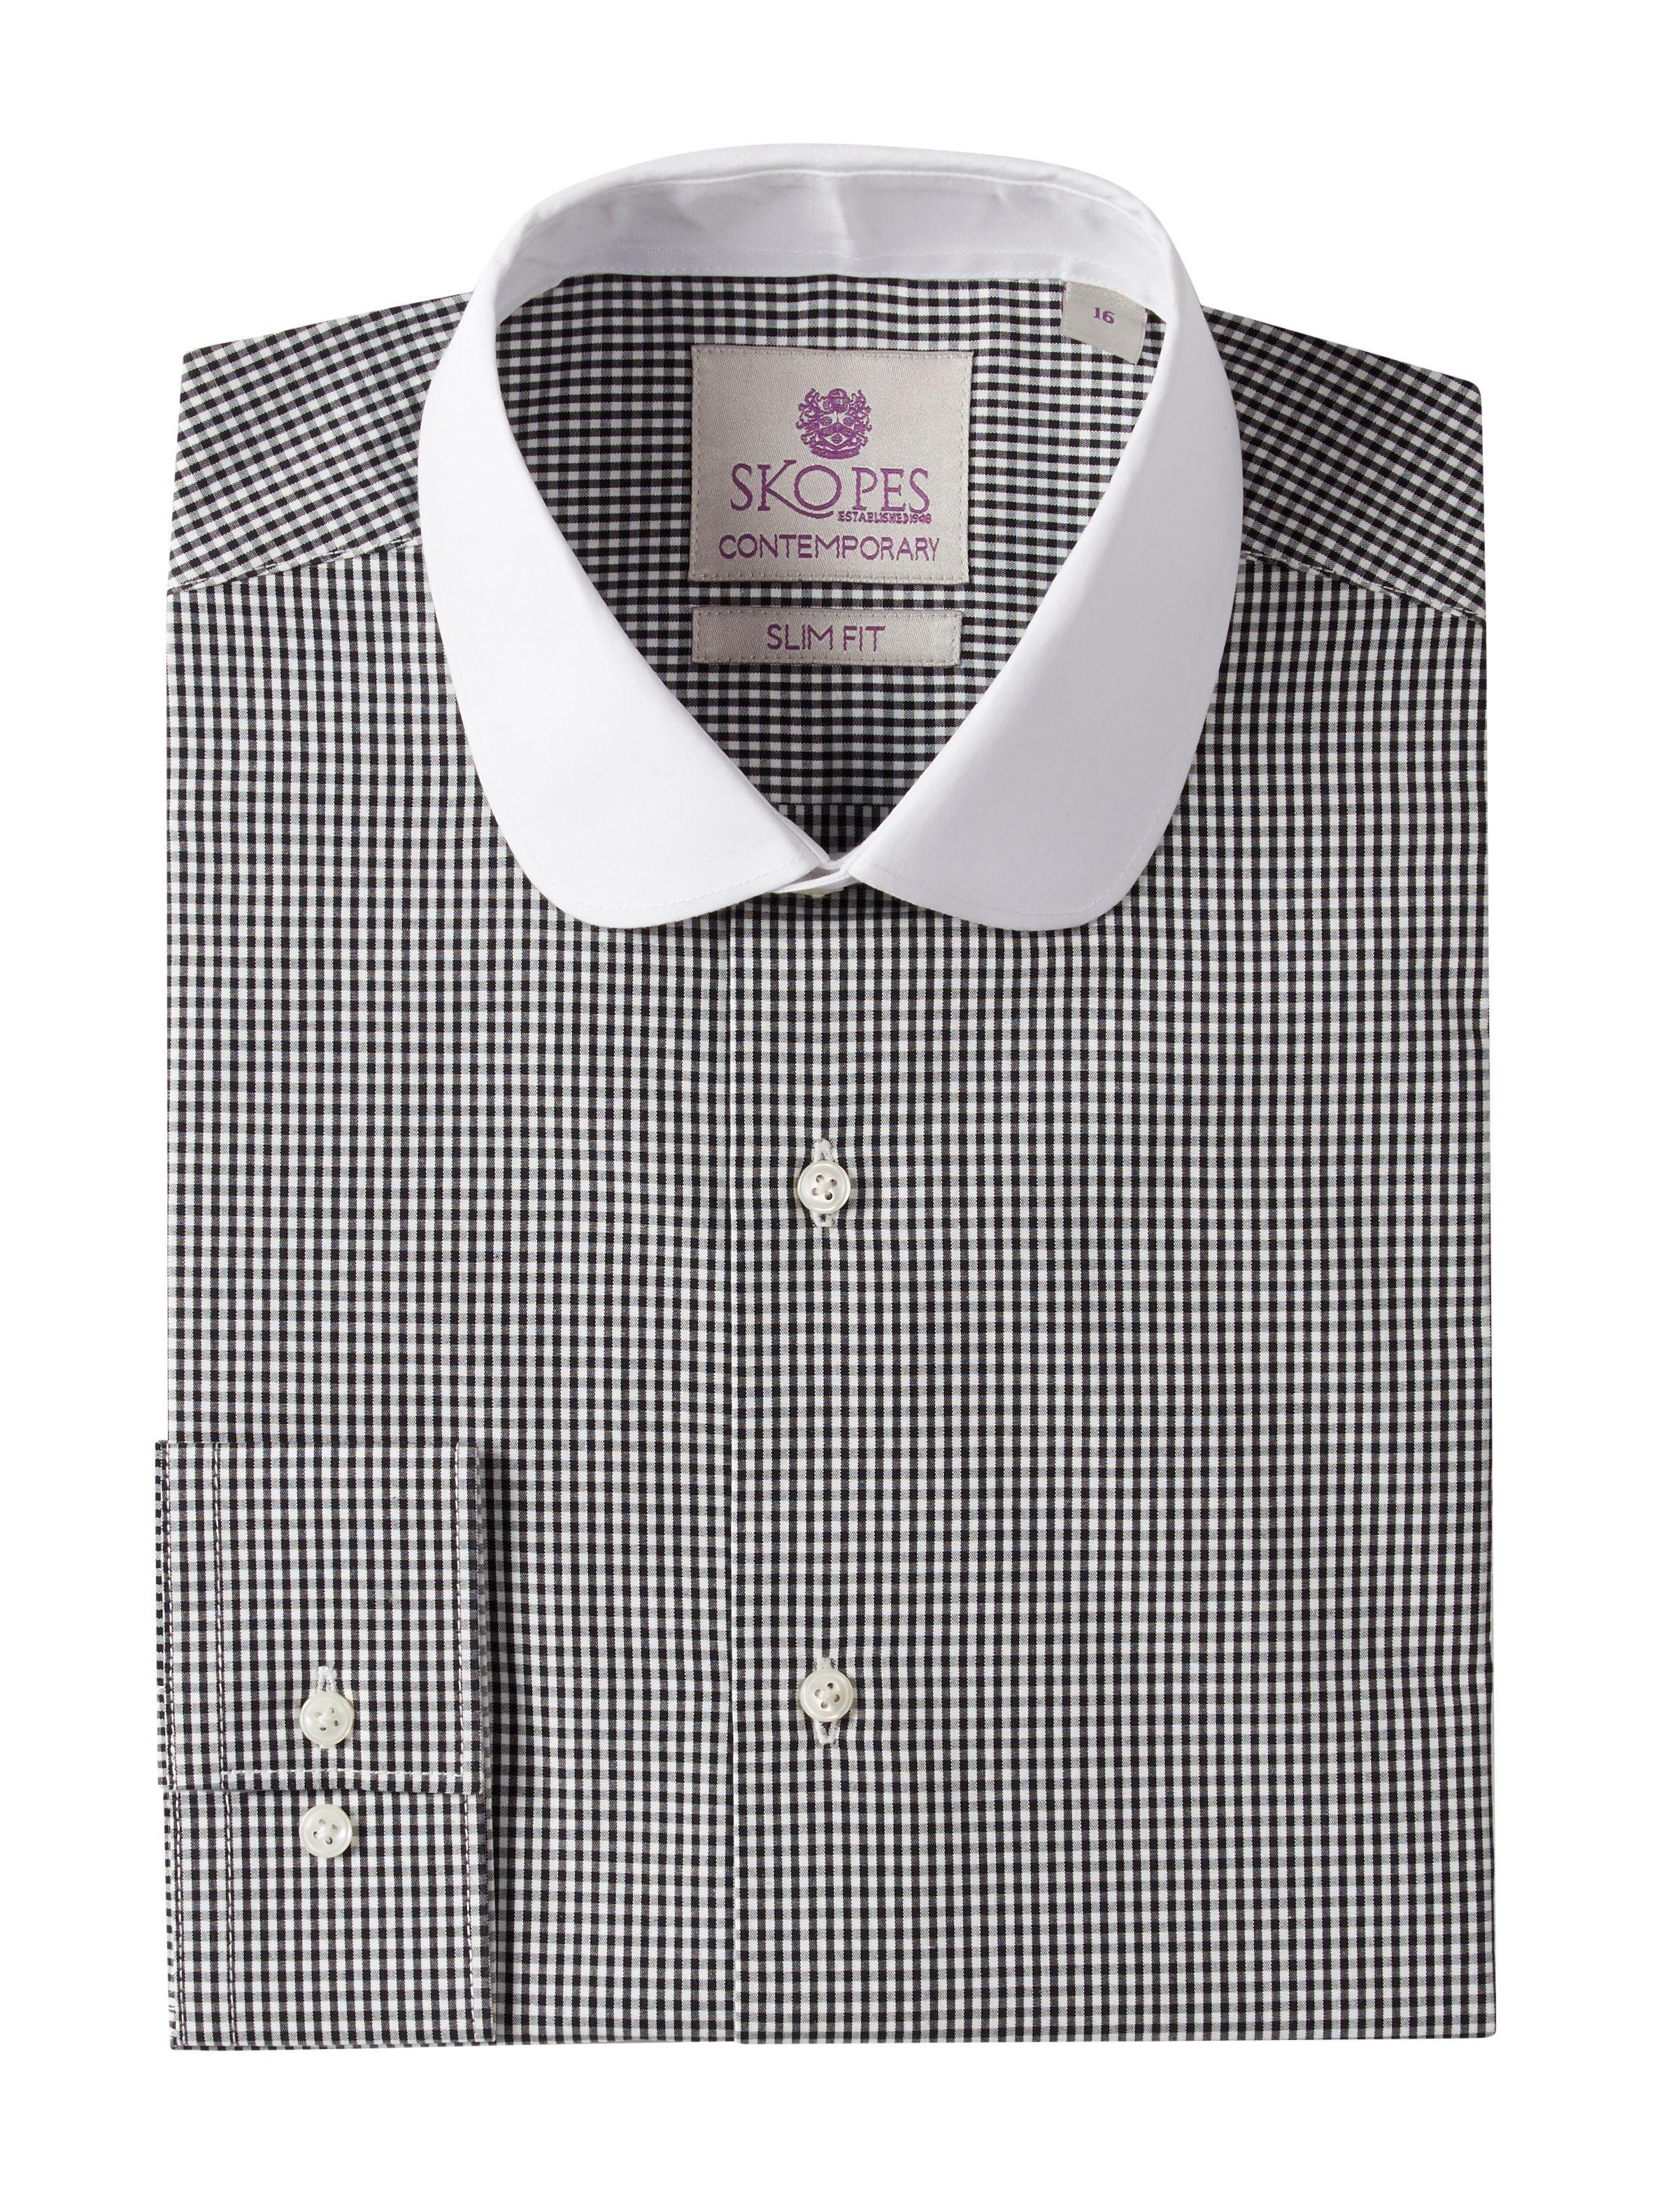 New 1920s Style Men S Dress Shirts Herren Mode Mode Mode Fur